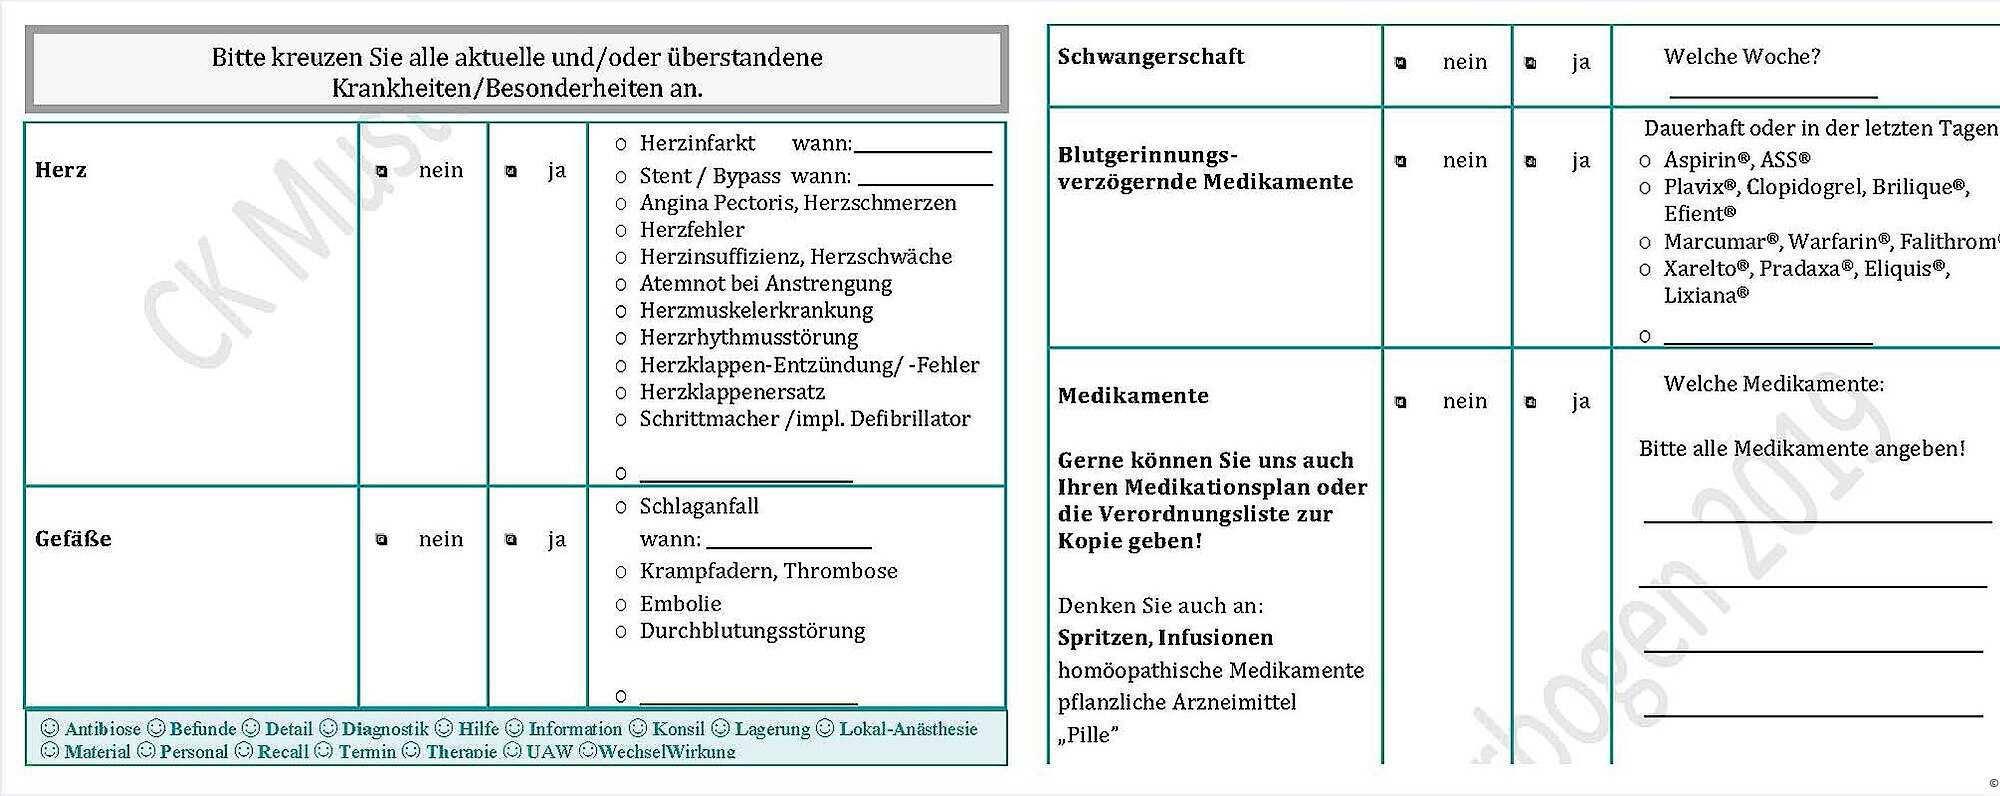 Allgemein Medizinische Anamnese Fur Die Prophylaxe Sitzung Prophylaxe Pnc Aktuell De